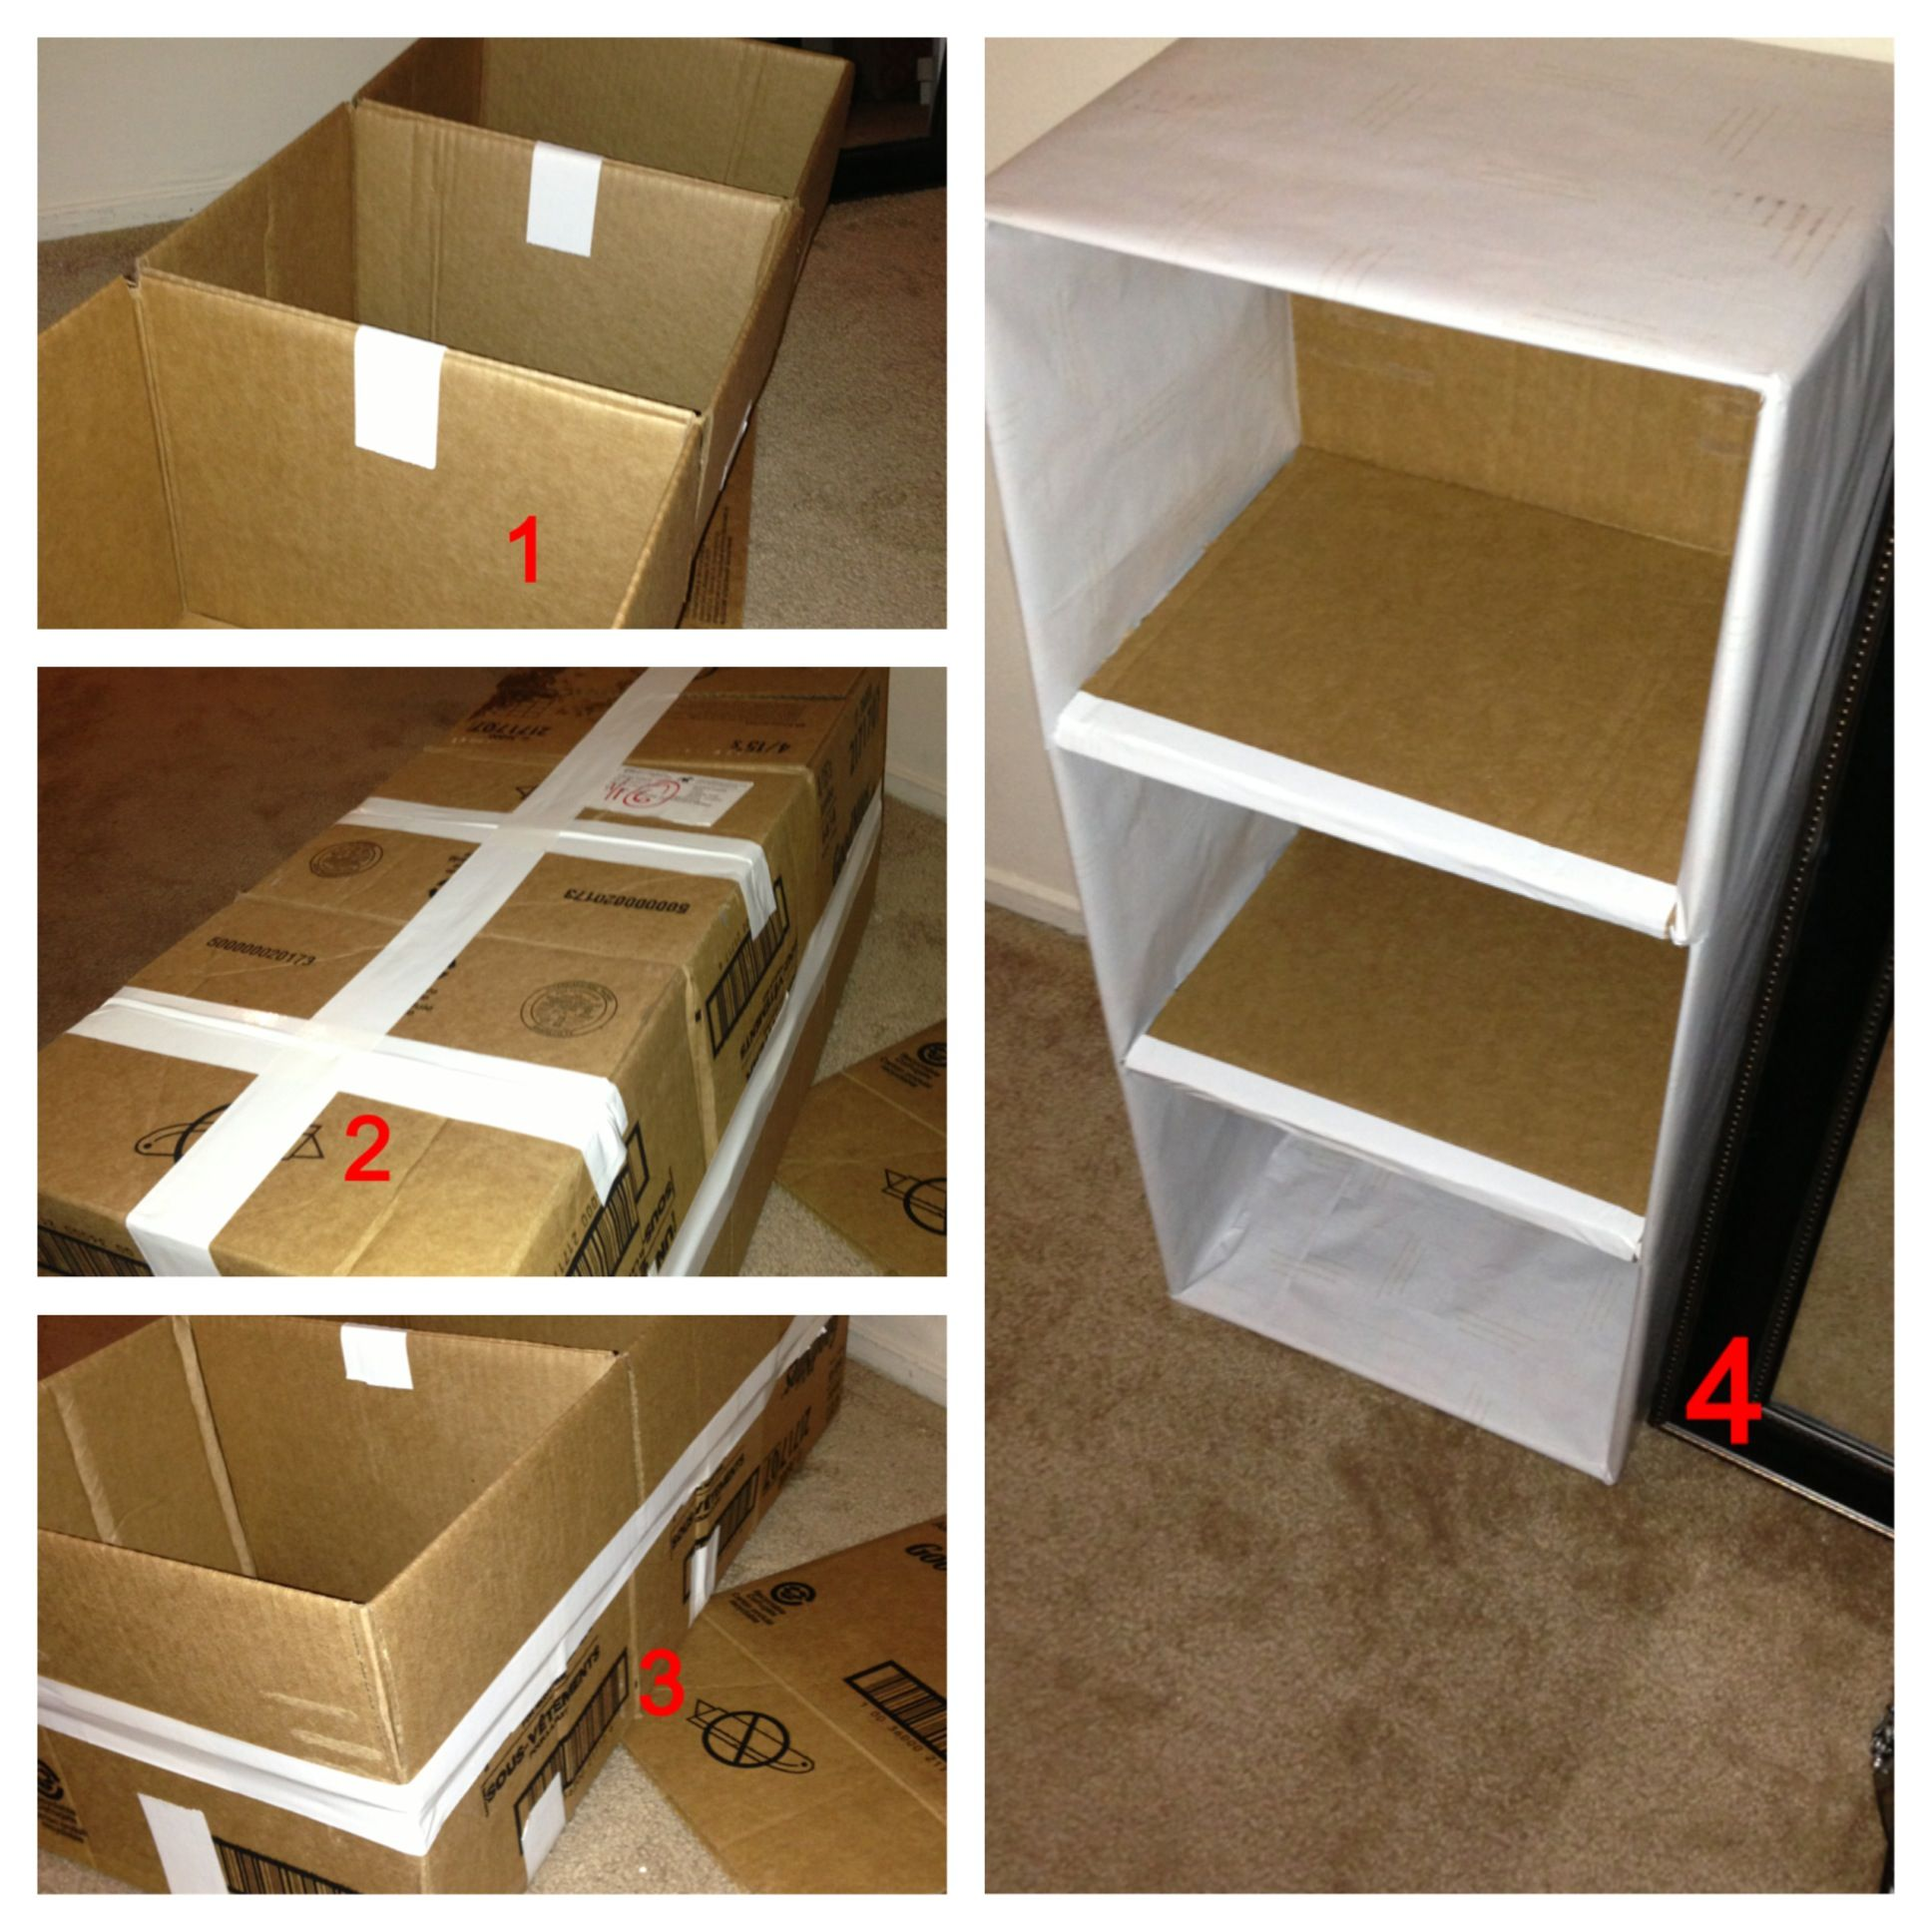 Diy tier shelf from cardboard boxes uganda diy home decor